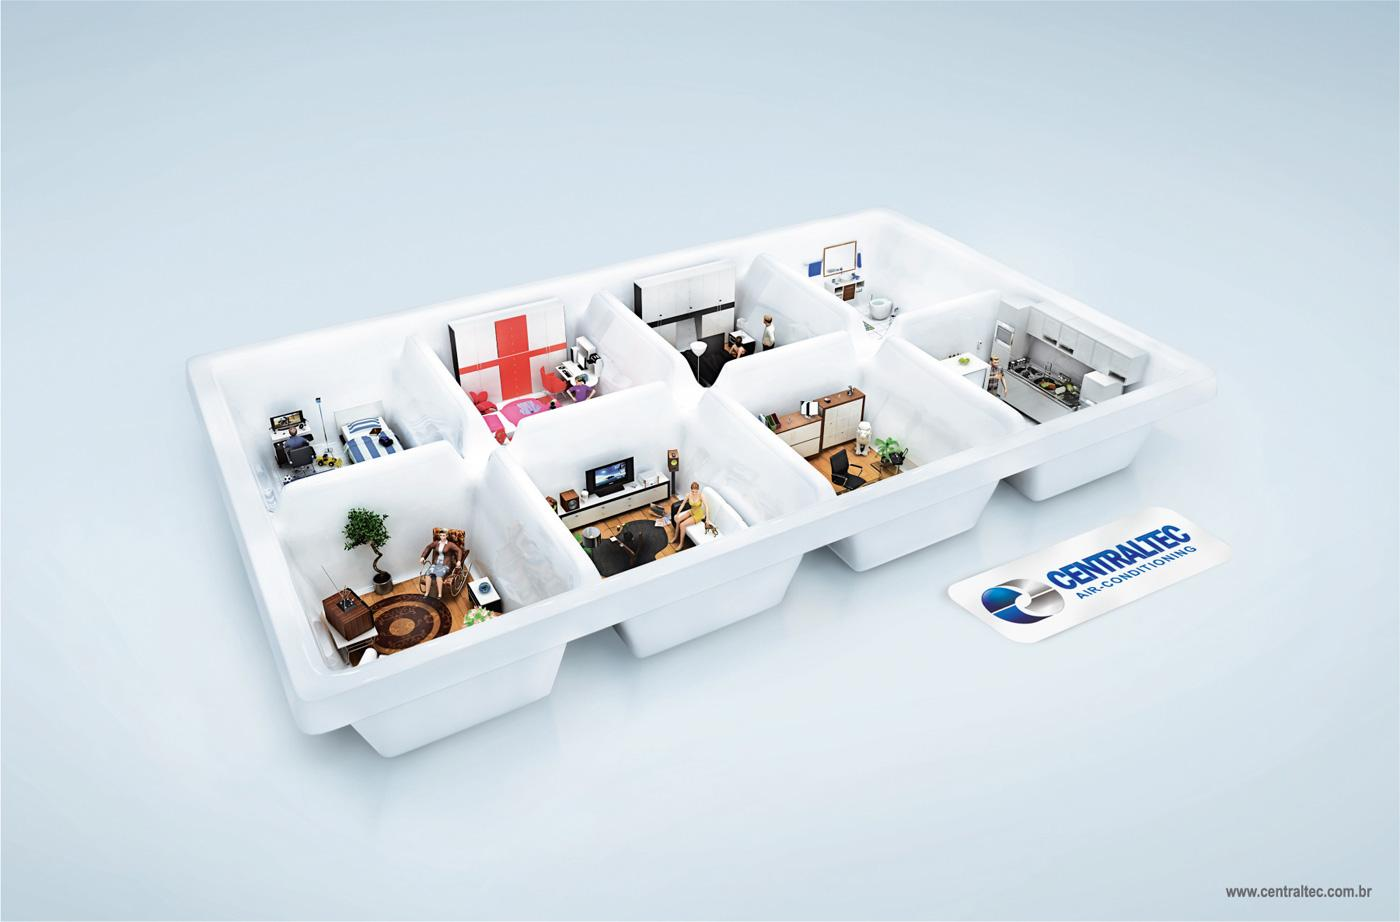 Centraltec Print Ad -  Ice tray